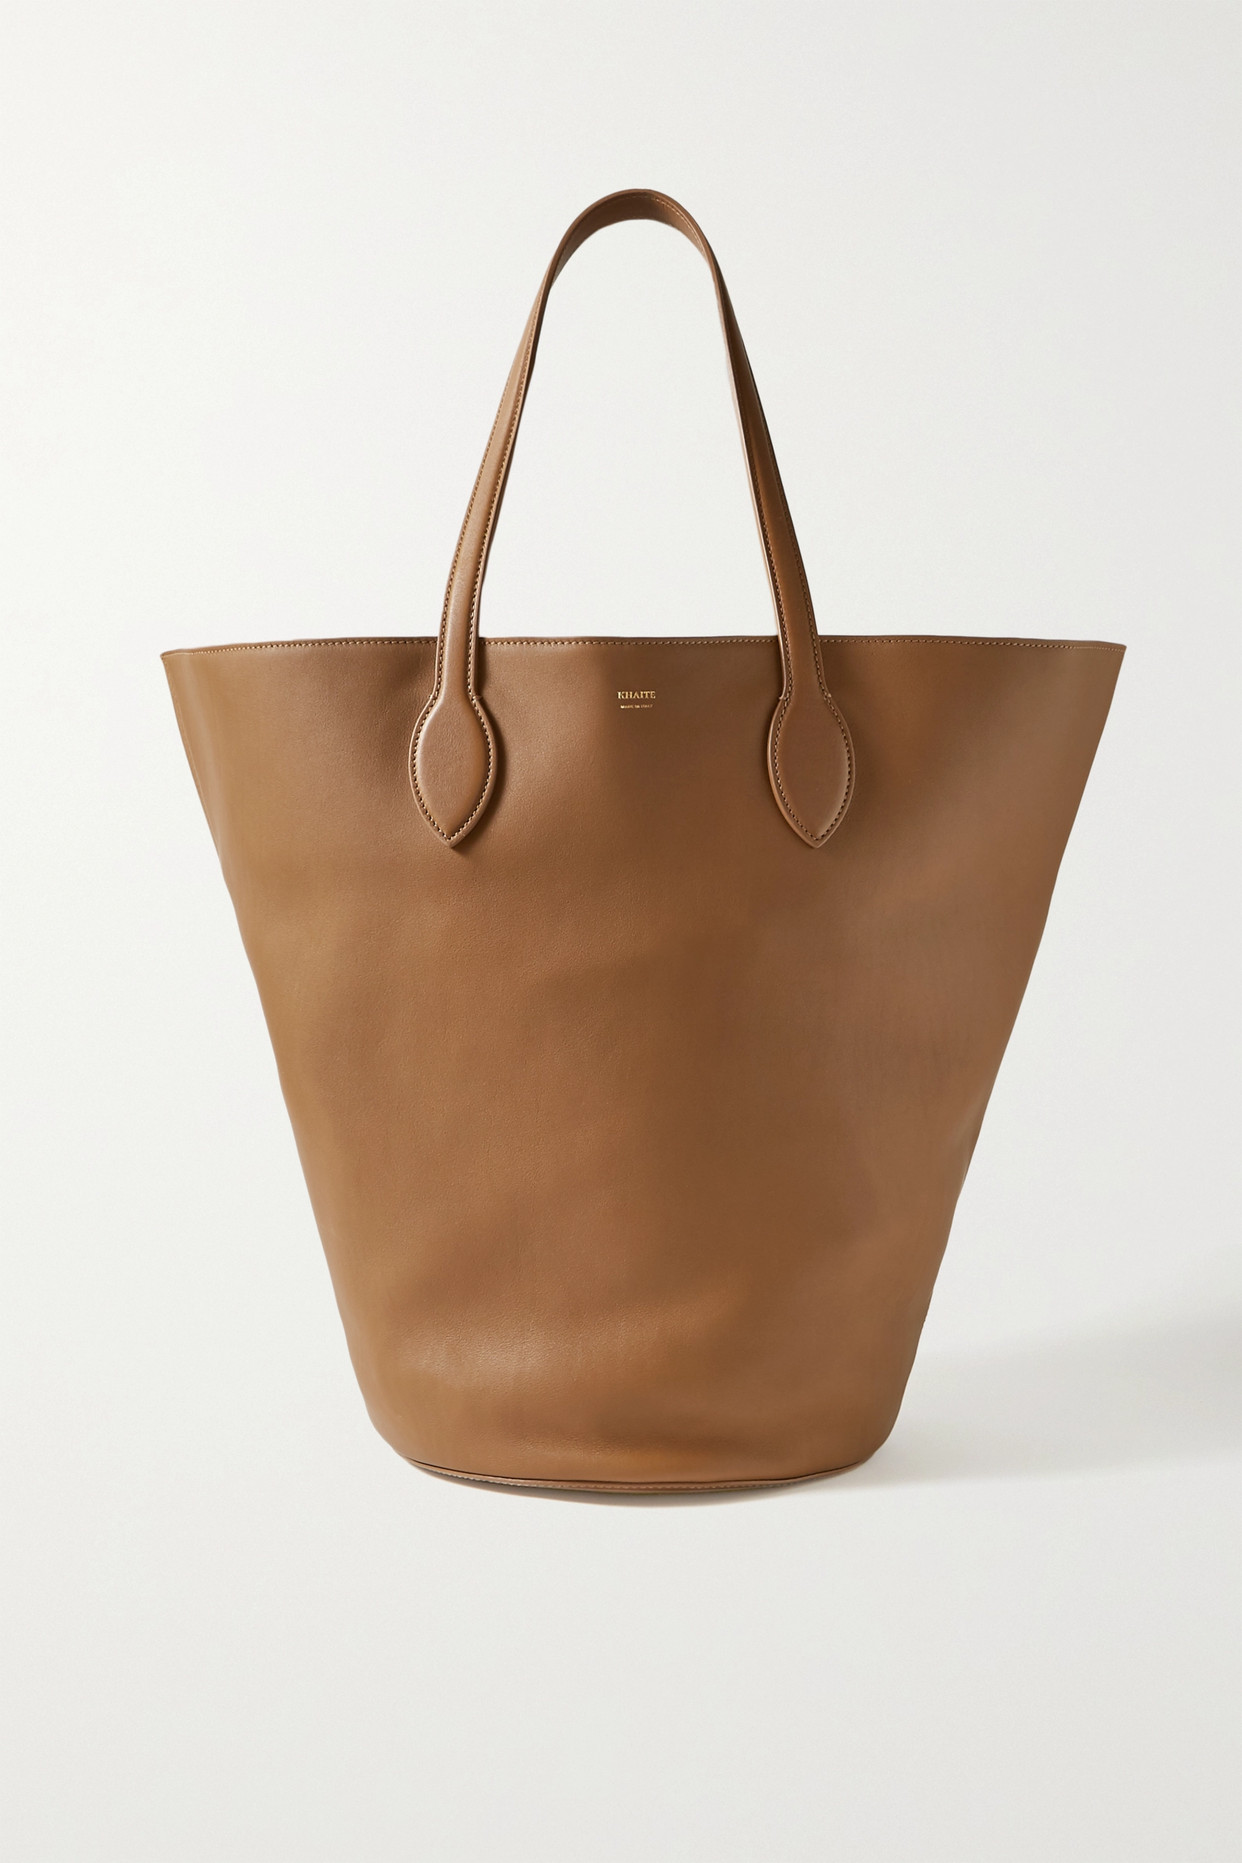 KHAITE - Circle 皮革中号手提包 - 棕色 - One size